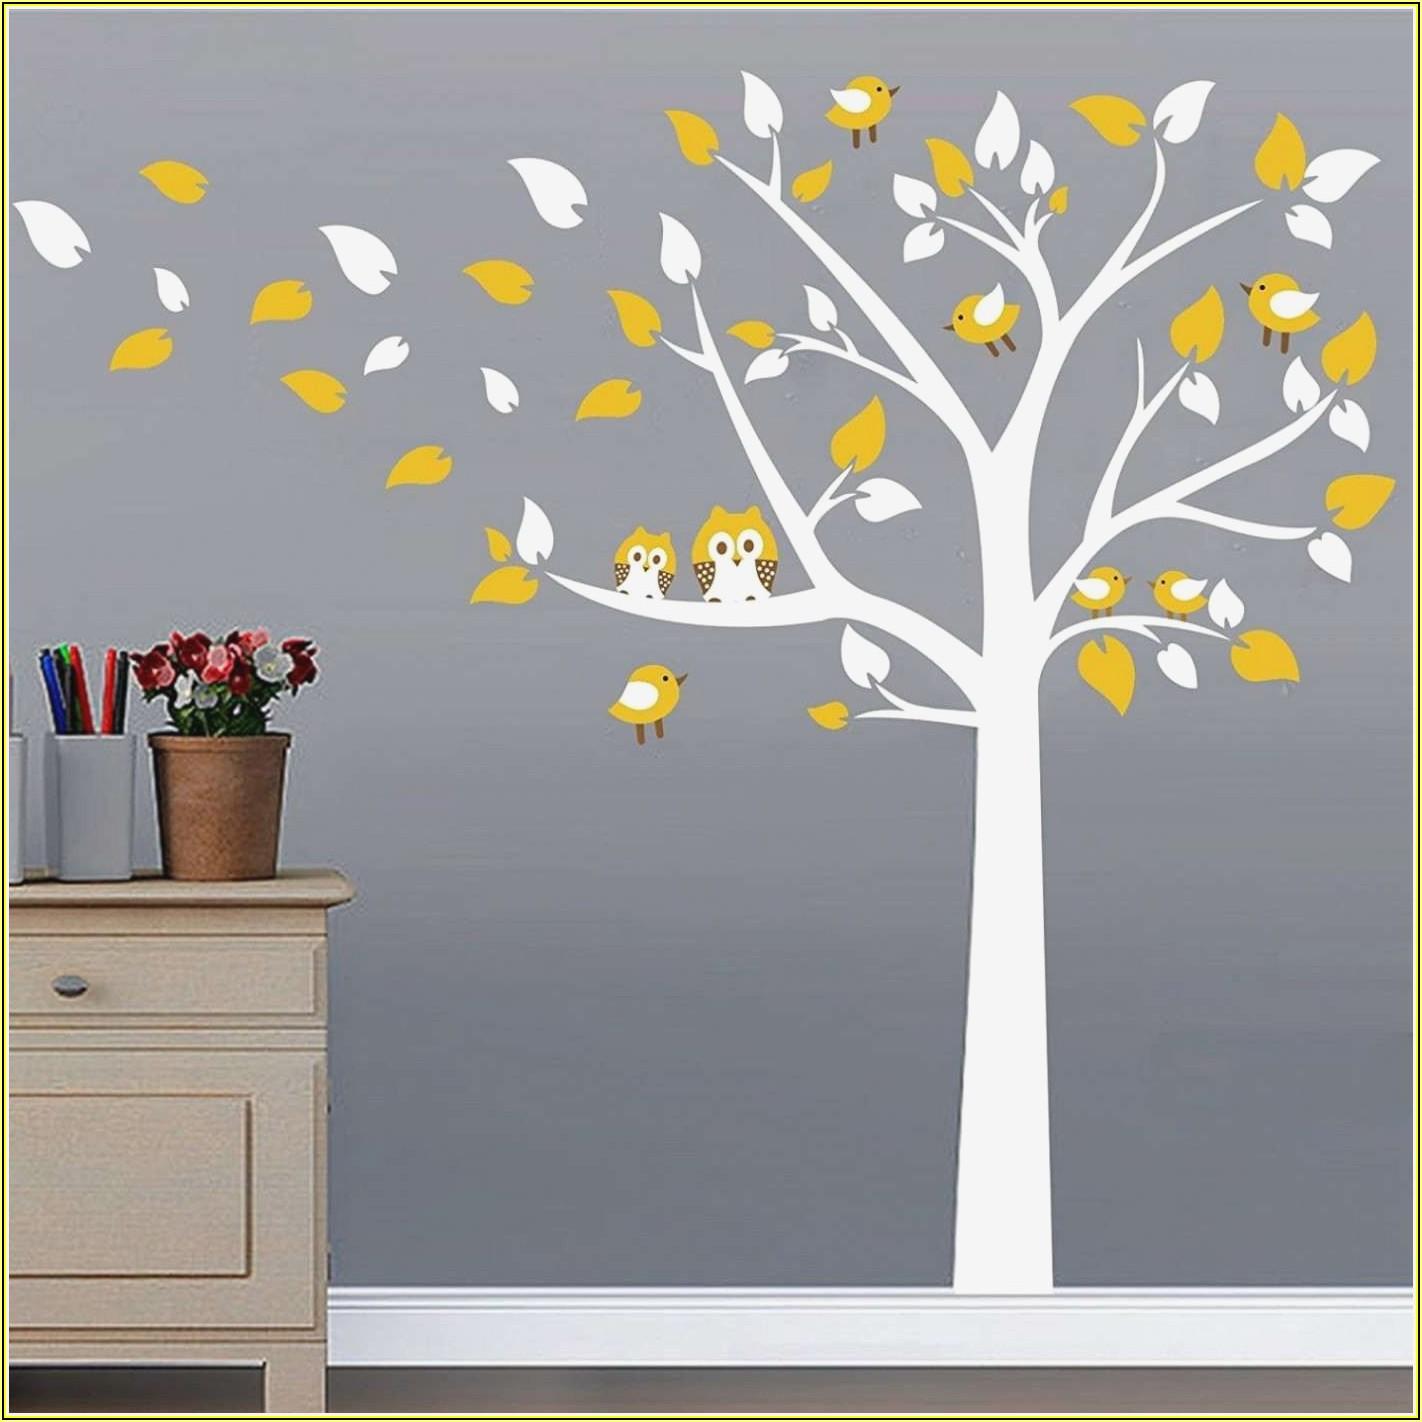 Baum Wand Kinderzimmer